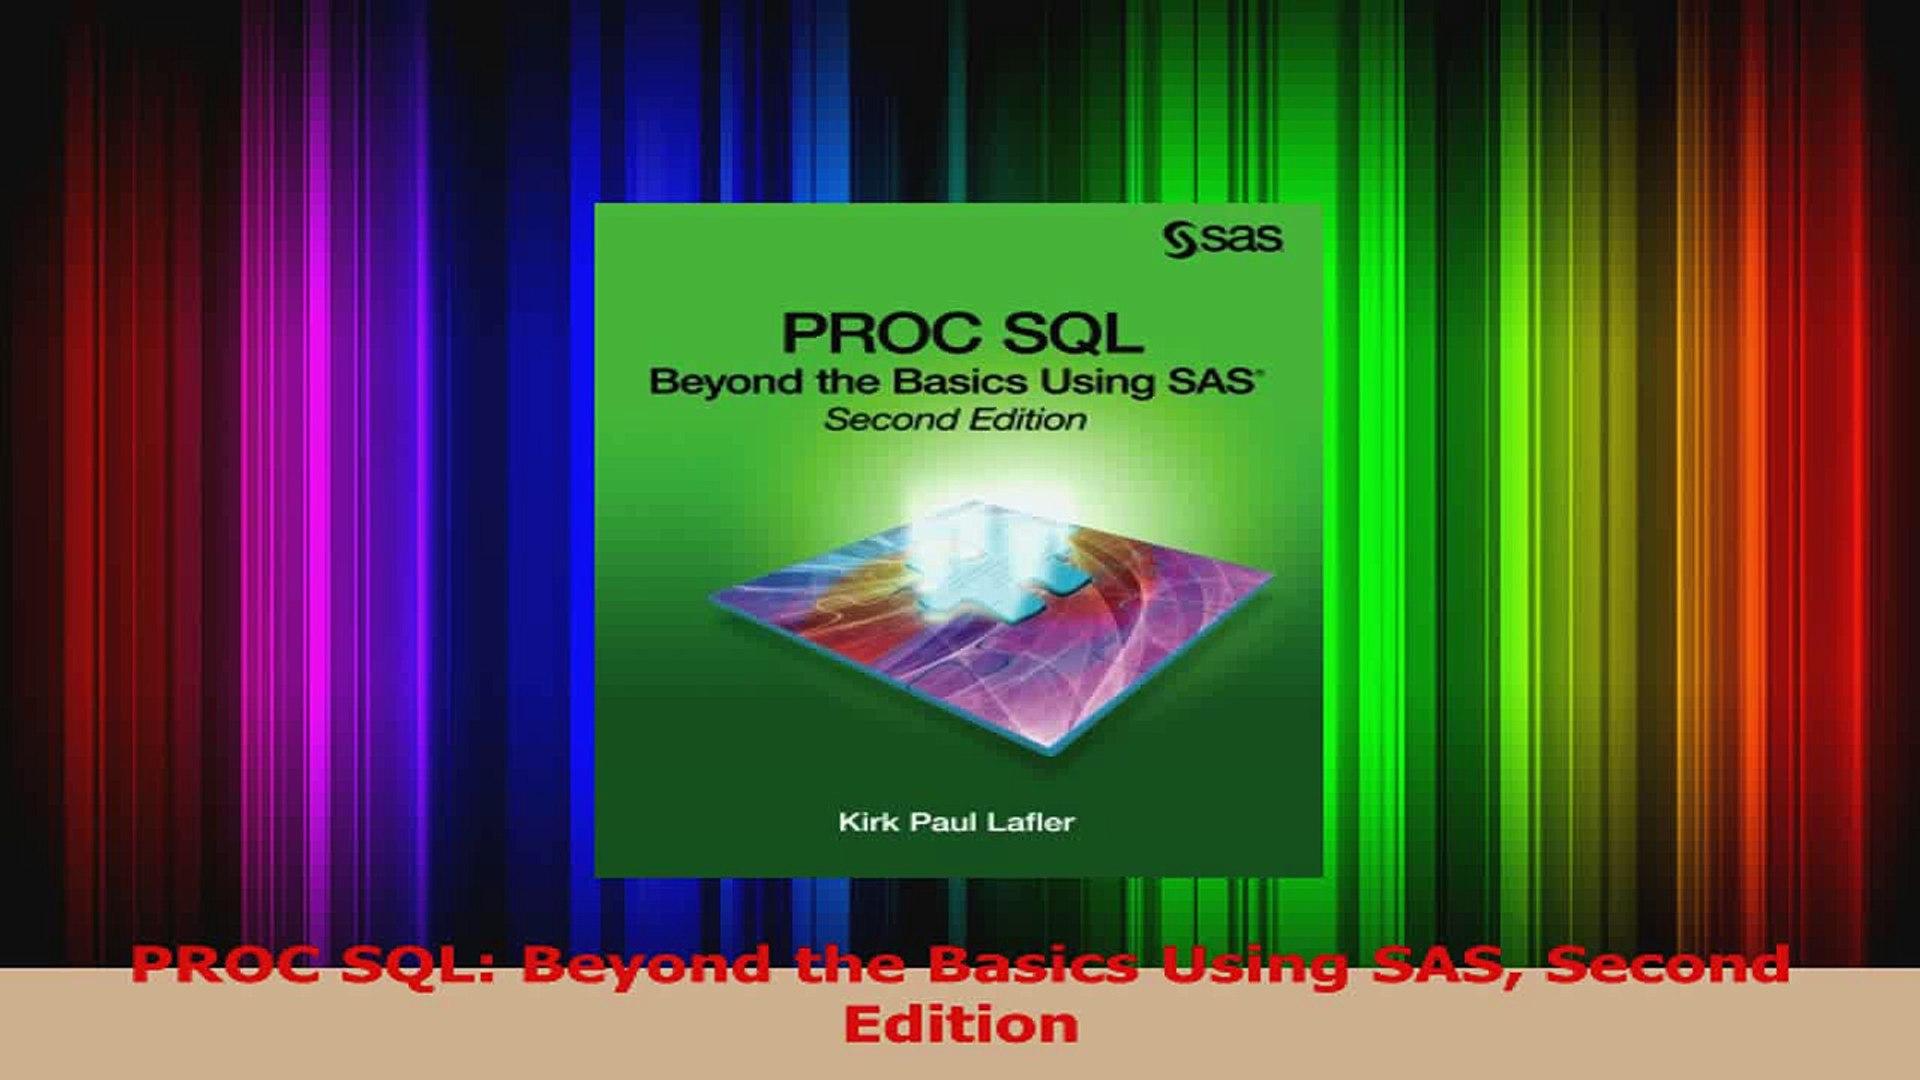 Read PROC SQL Beyond the Basics Using SAS Second Edition PDF Online